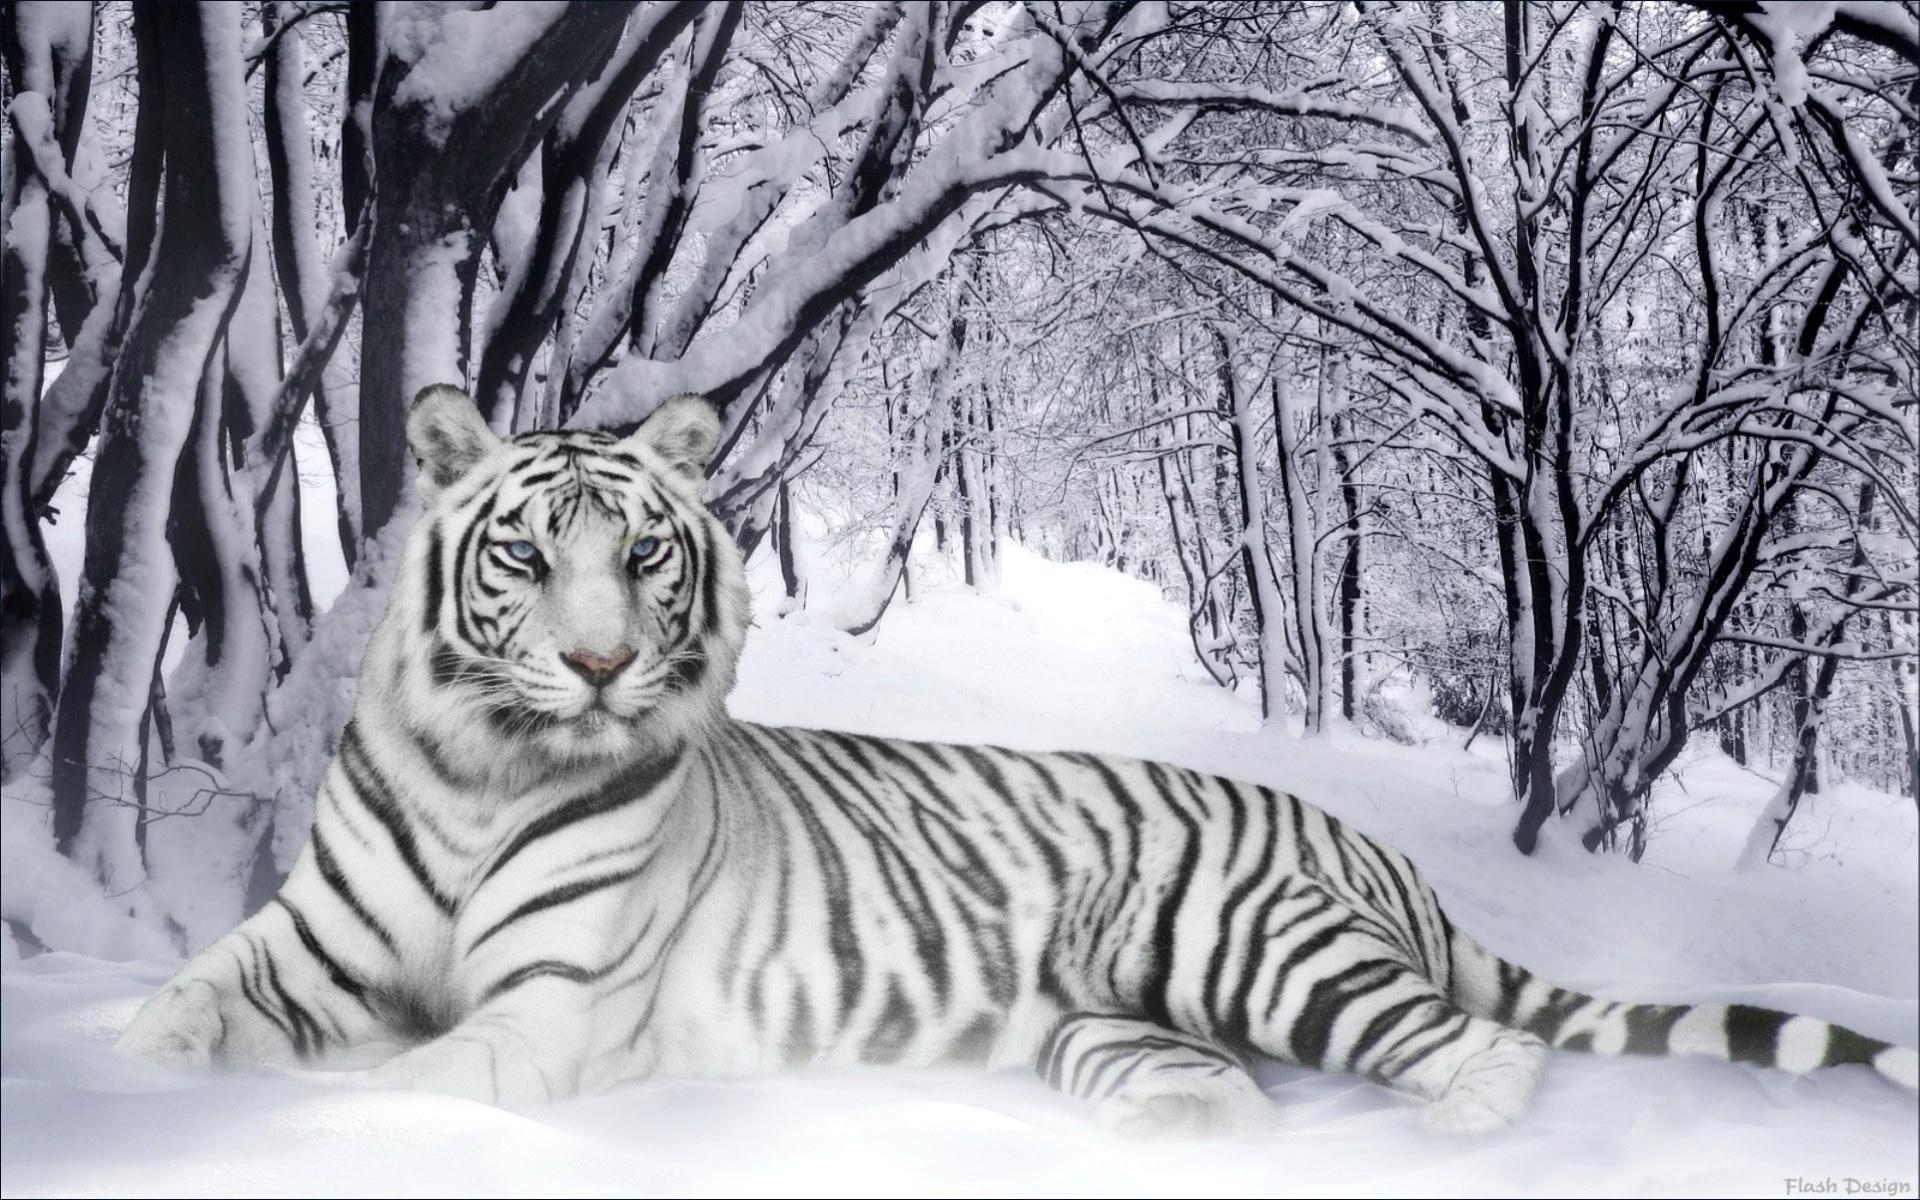 White Bengal Tigers : animals, bengal, t, en, fact ... on monkey habitat in the wild, dolphin habitat in the wild, snake habitat in the wild, panda habitat in the wild, rabbit habitat in the wild,